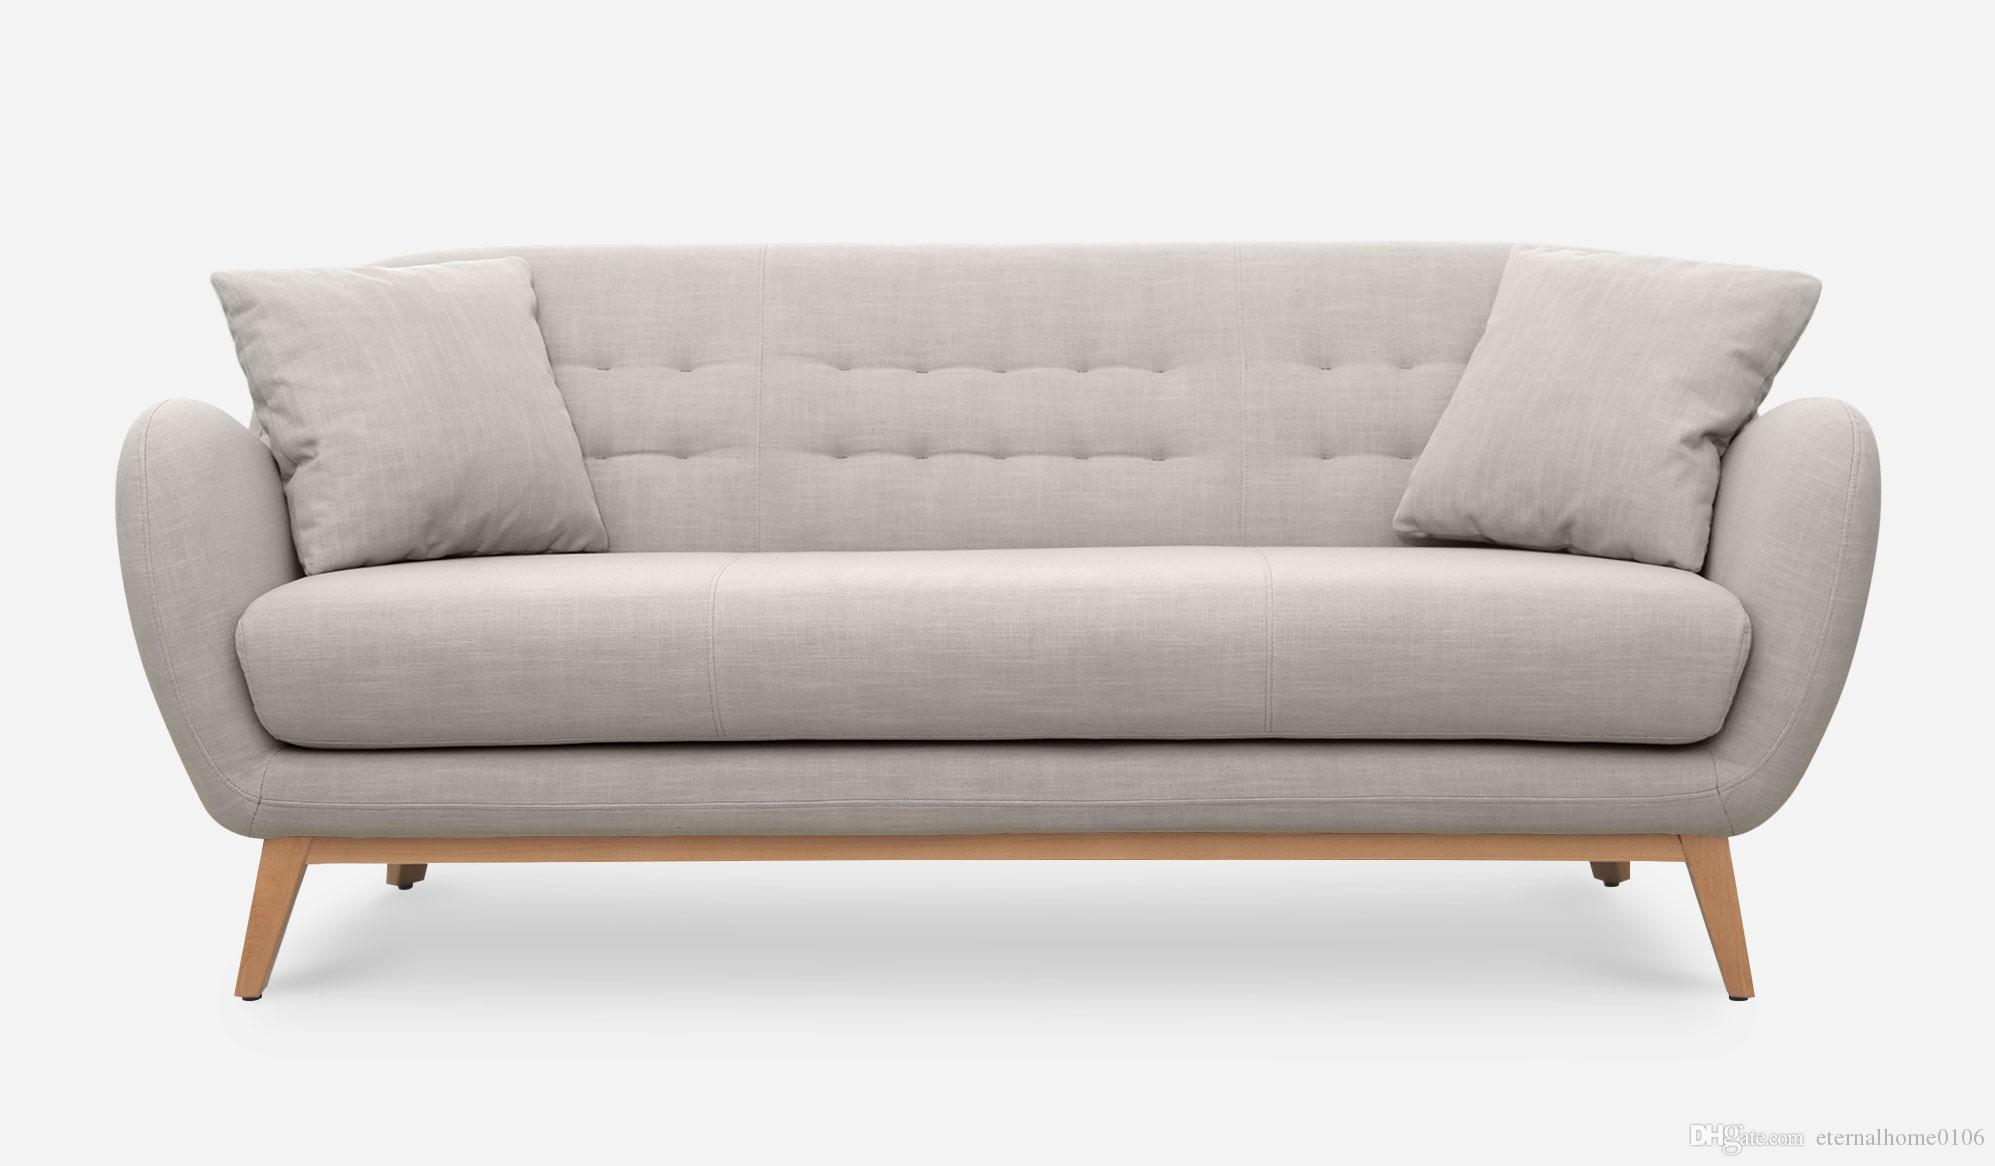 Compre Mid Century Mobiliario Moderno Muebles Otomana Salón Sofá De ...